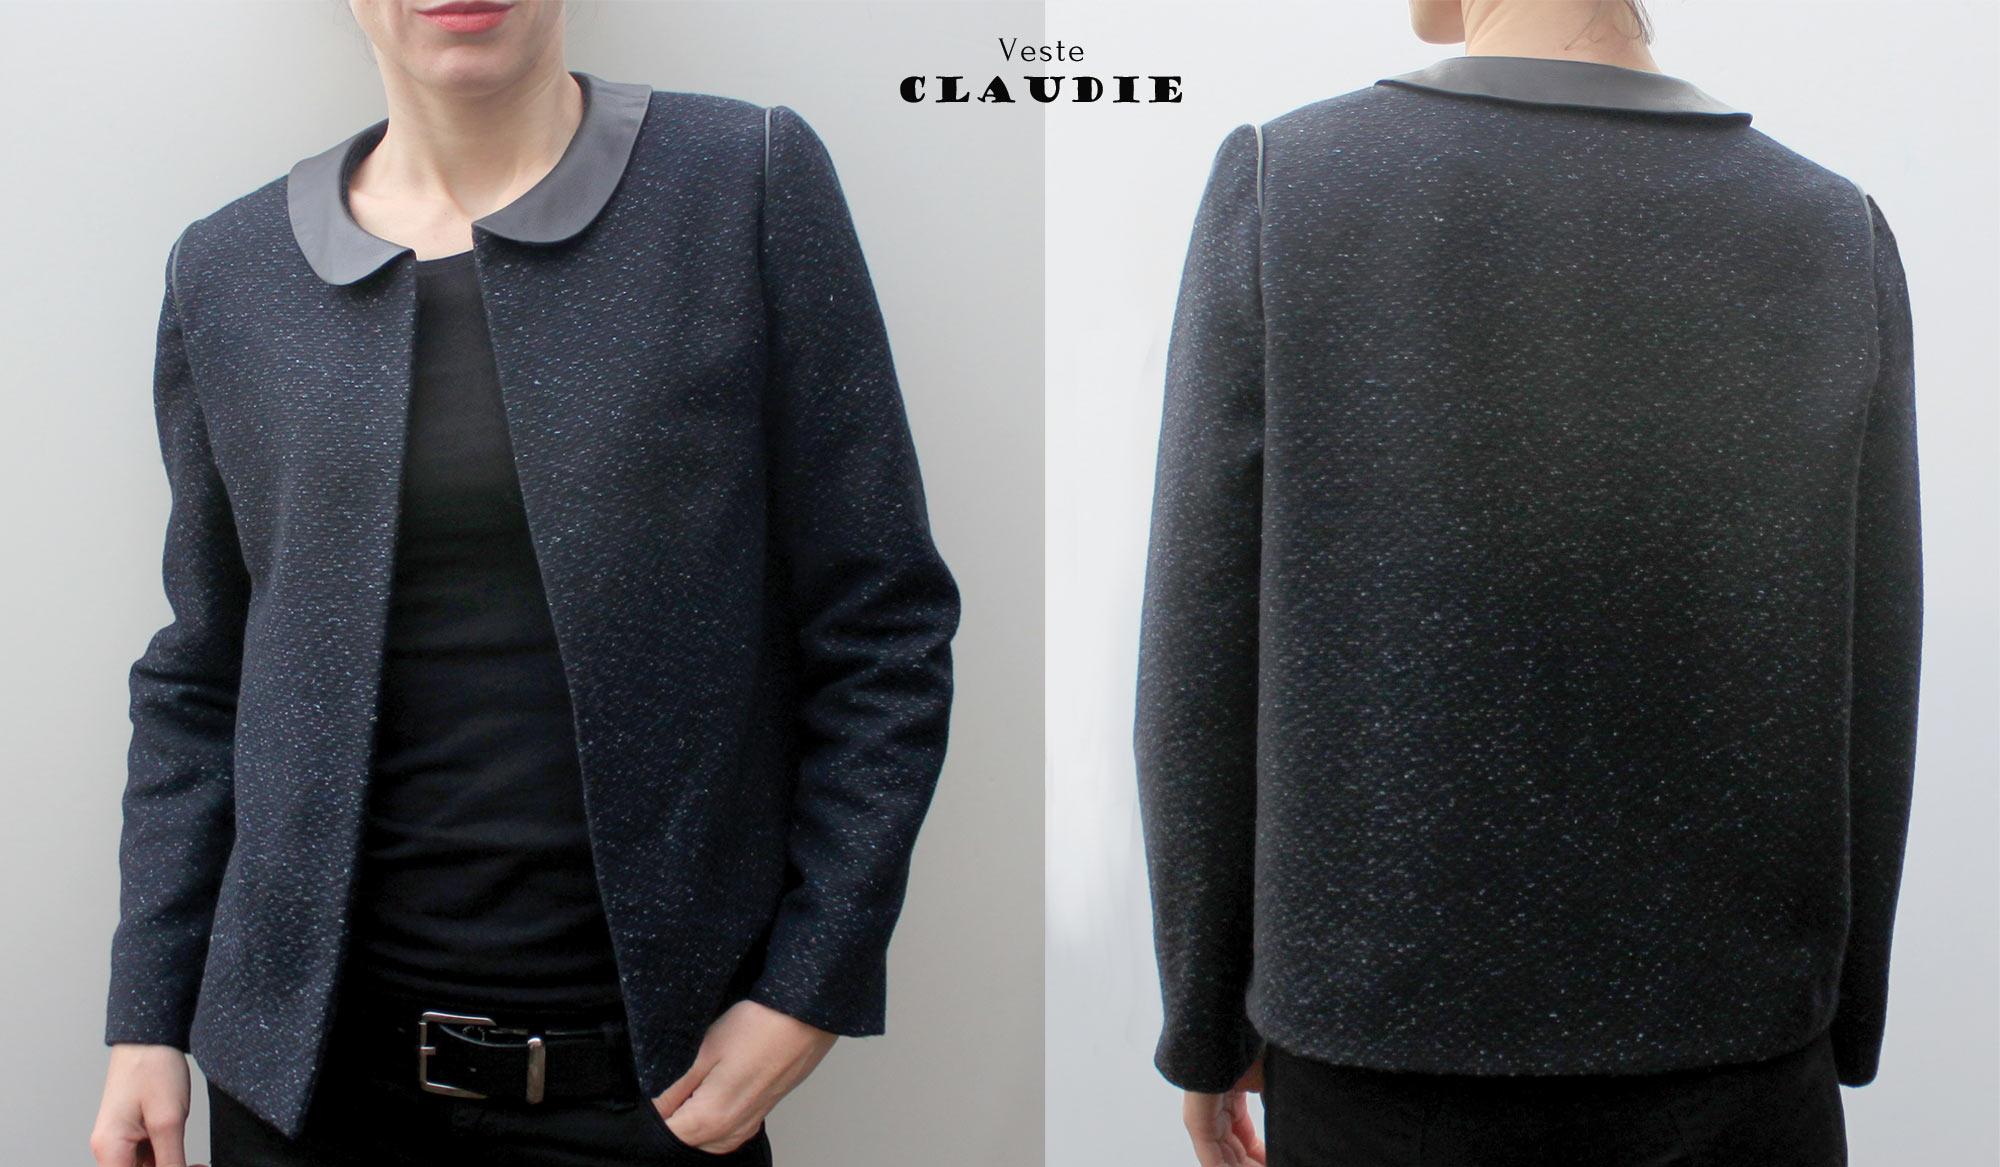 Hervorragend Veste Claudie // Nouveau patron | Atelier Scammit MK75